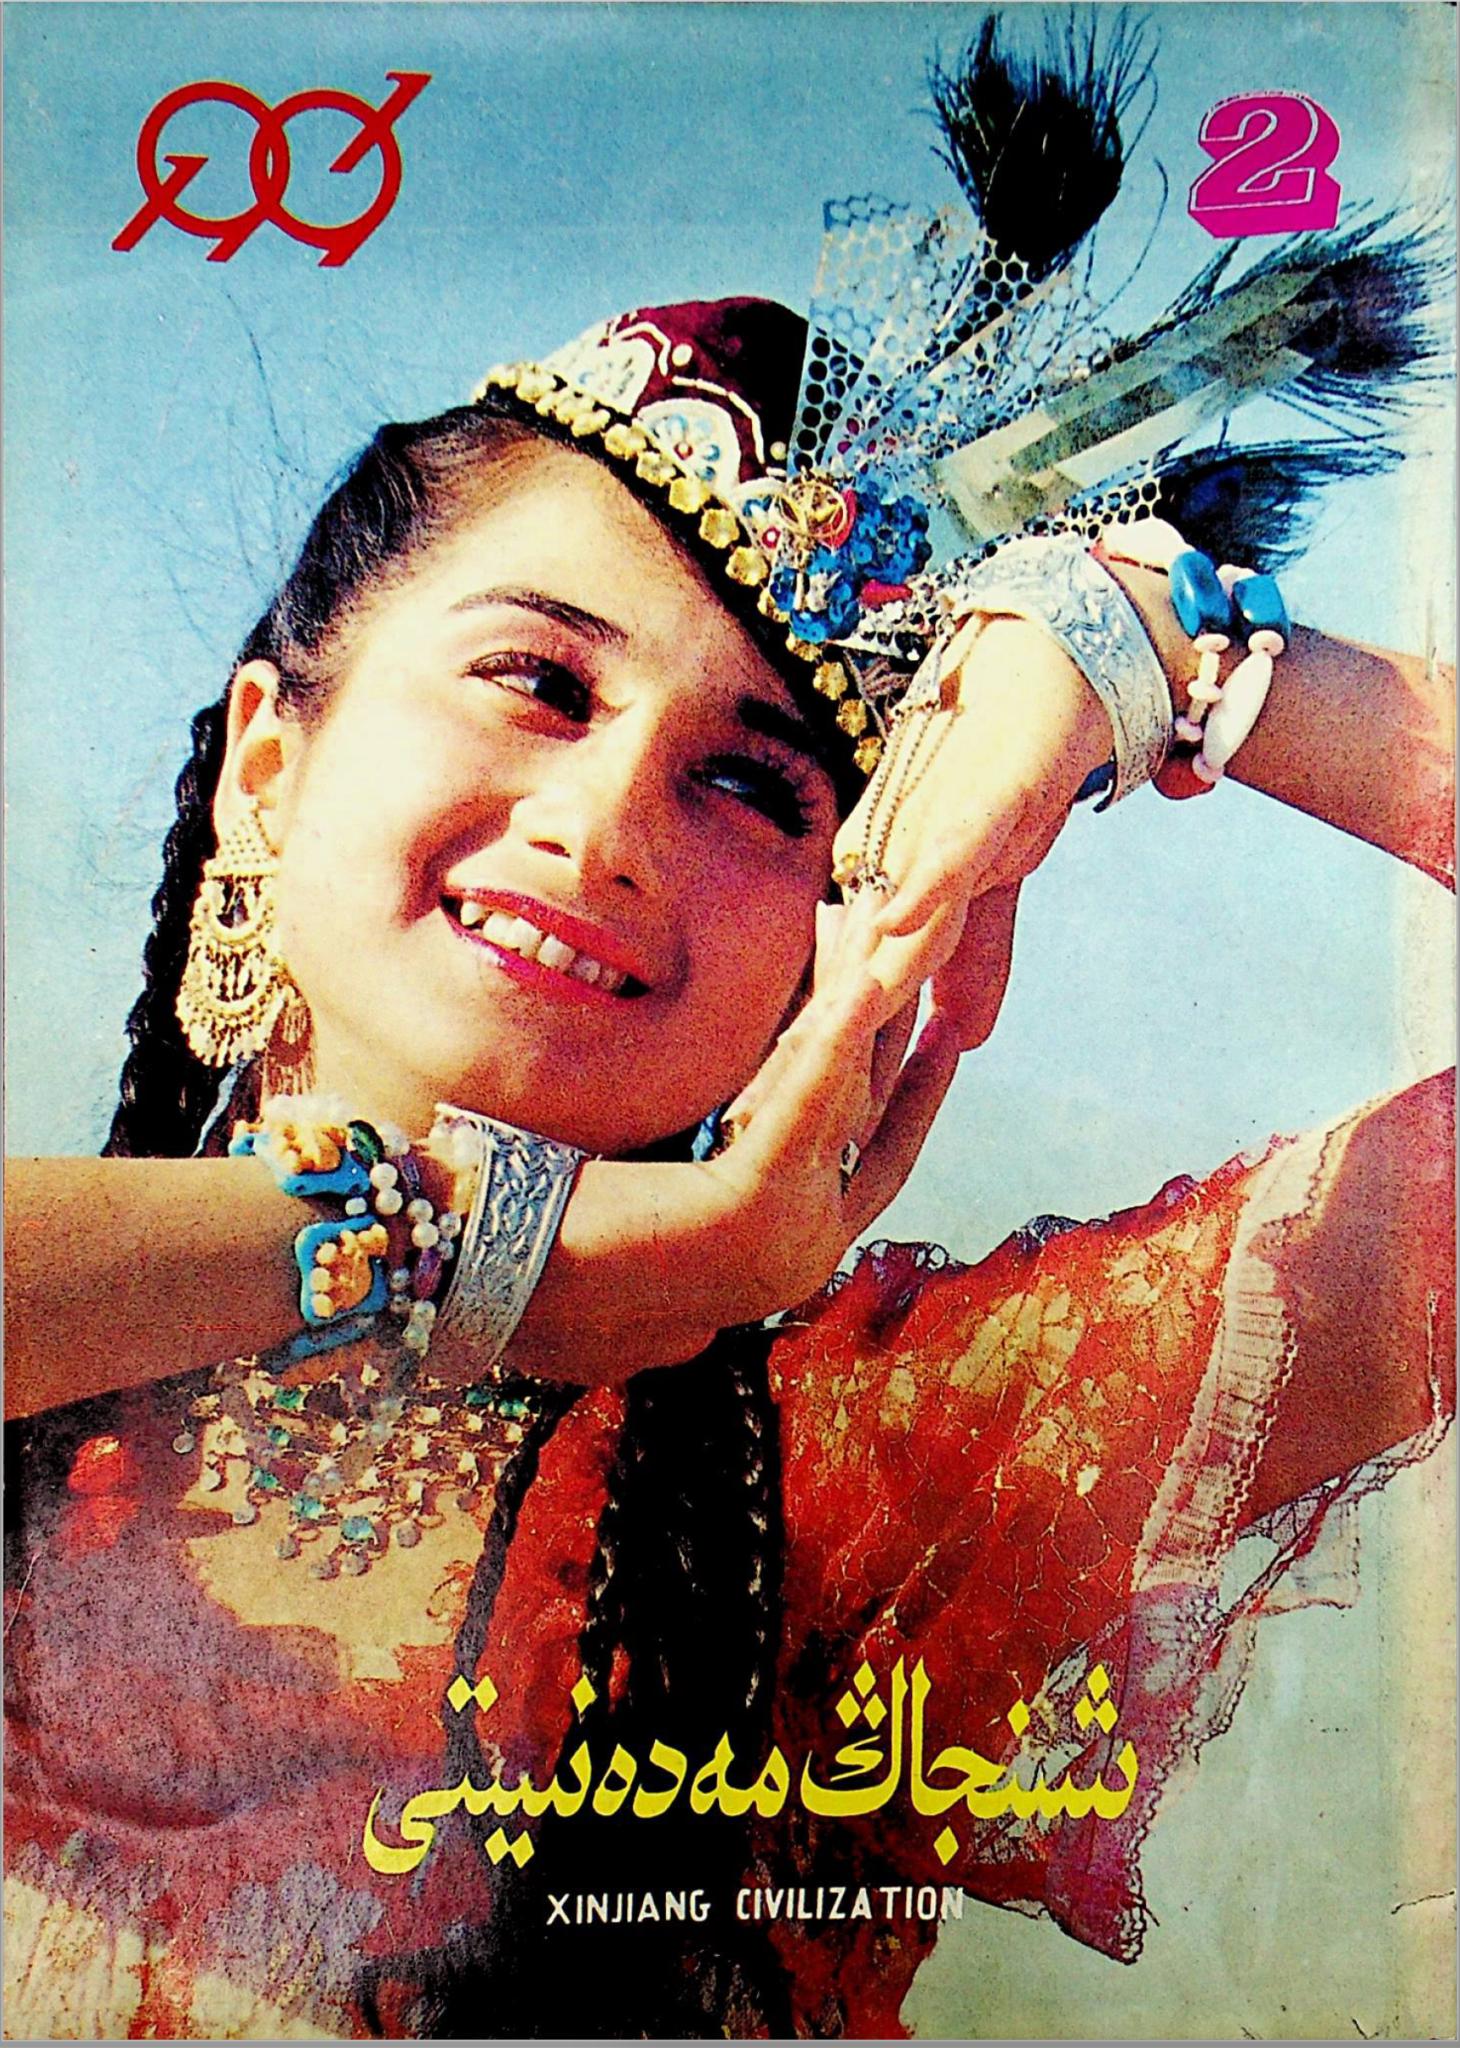 Screenshot 2020 02 26 at 12.05.22 - شىنجاڭ مەدەنىيىتى 1991-يىلى 2 -سان